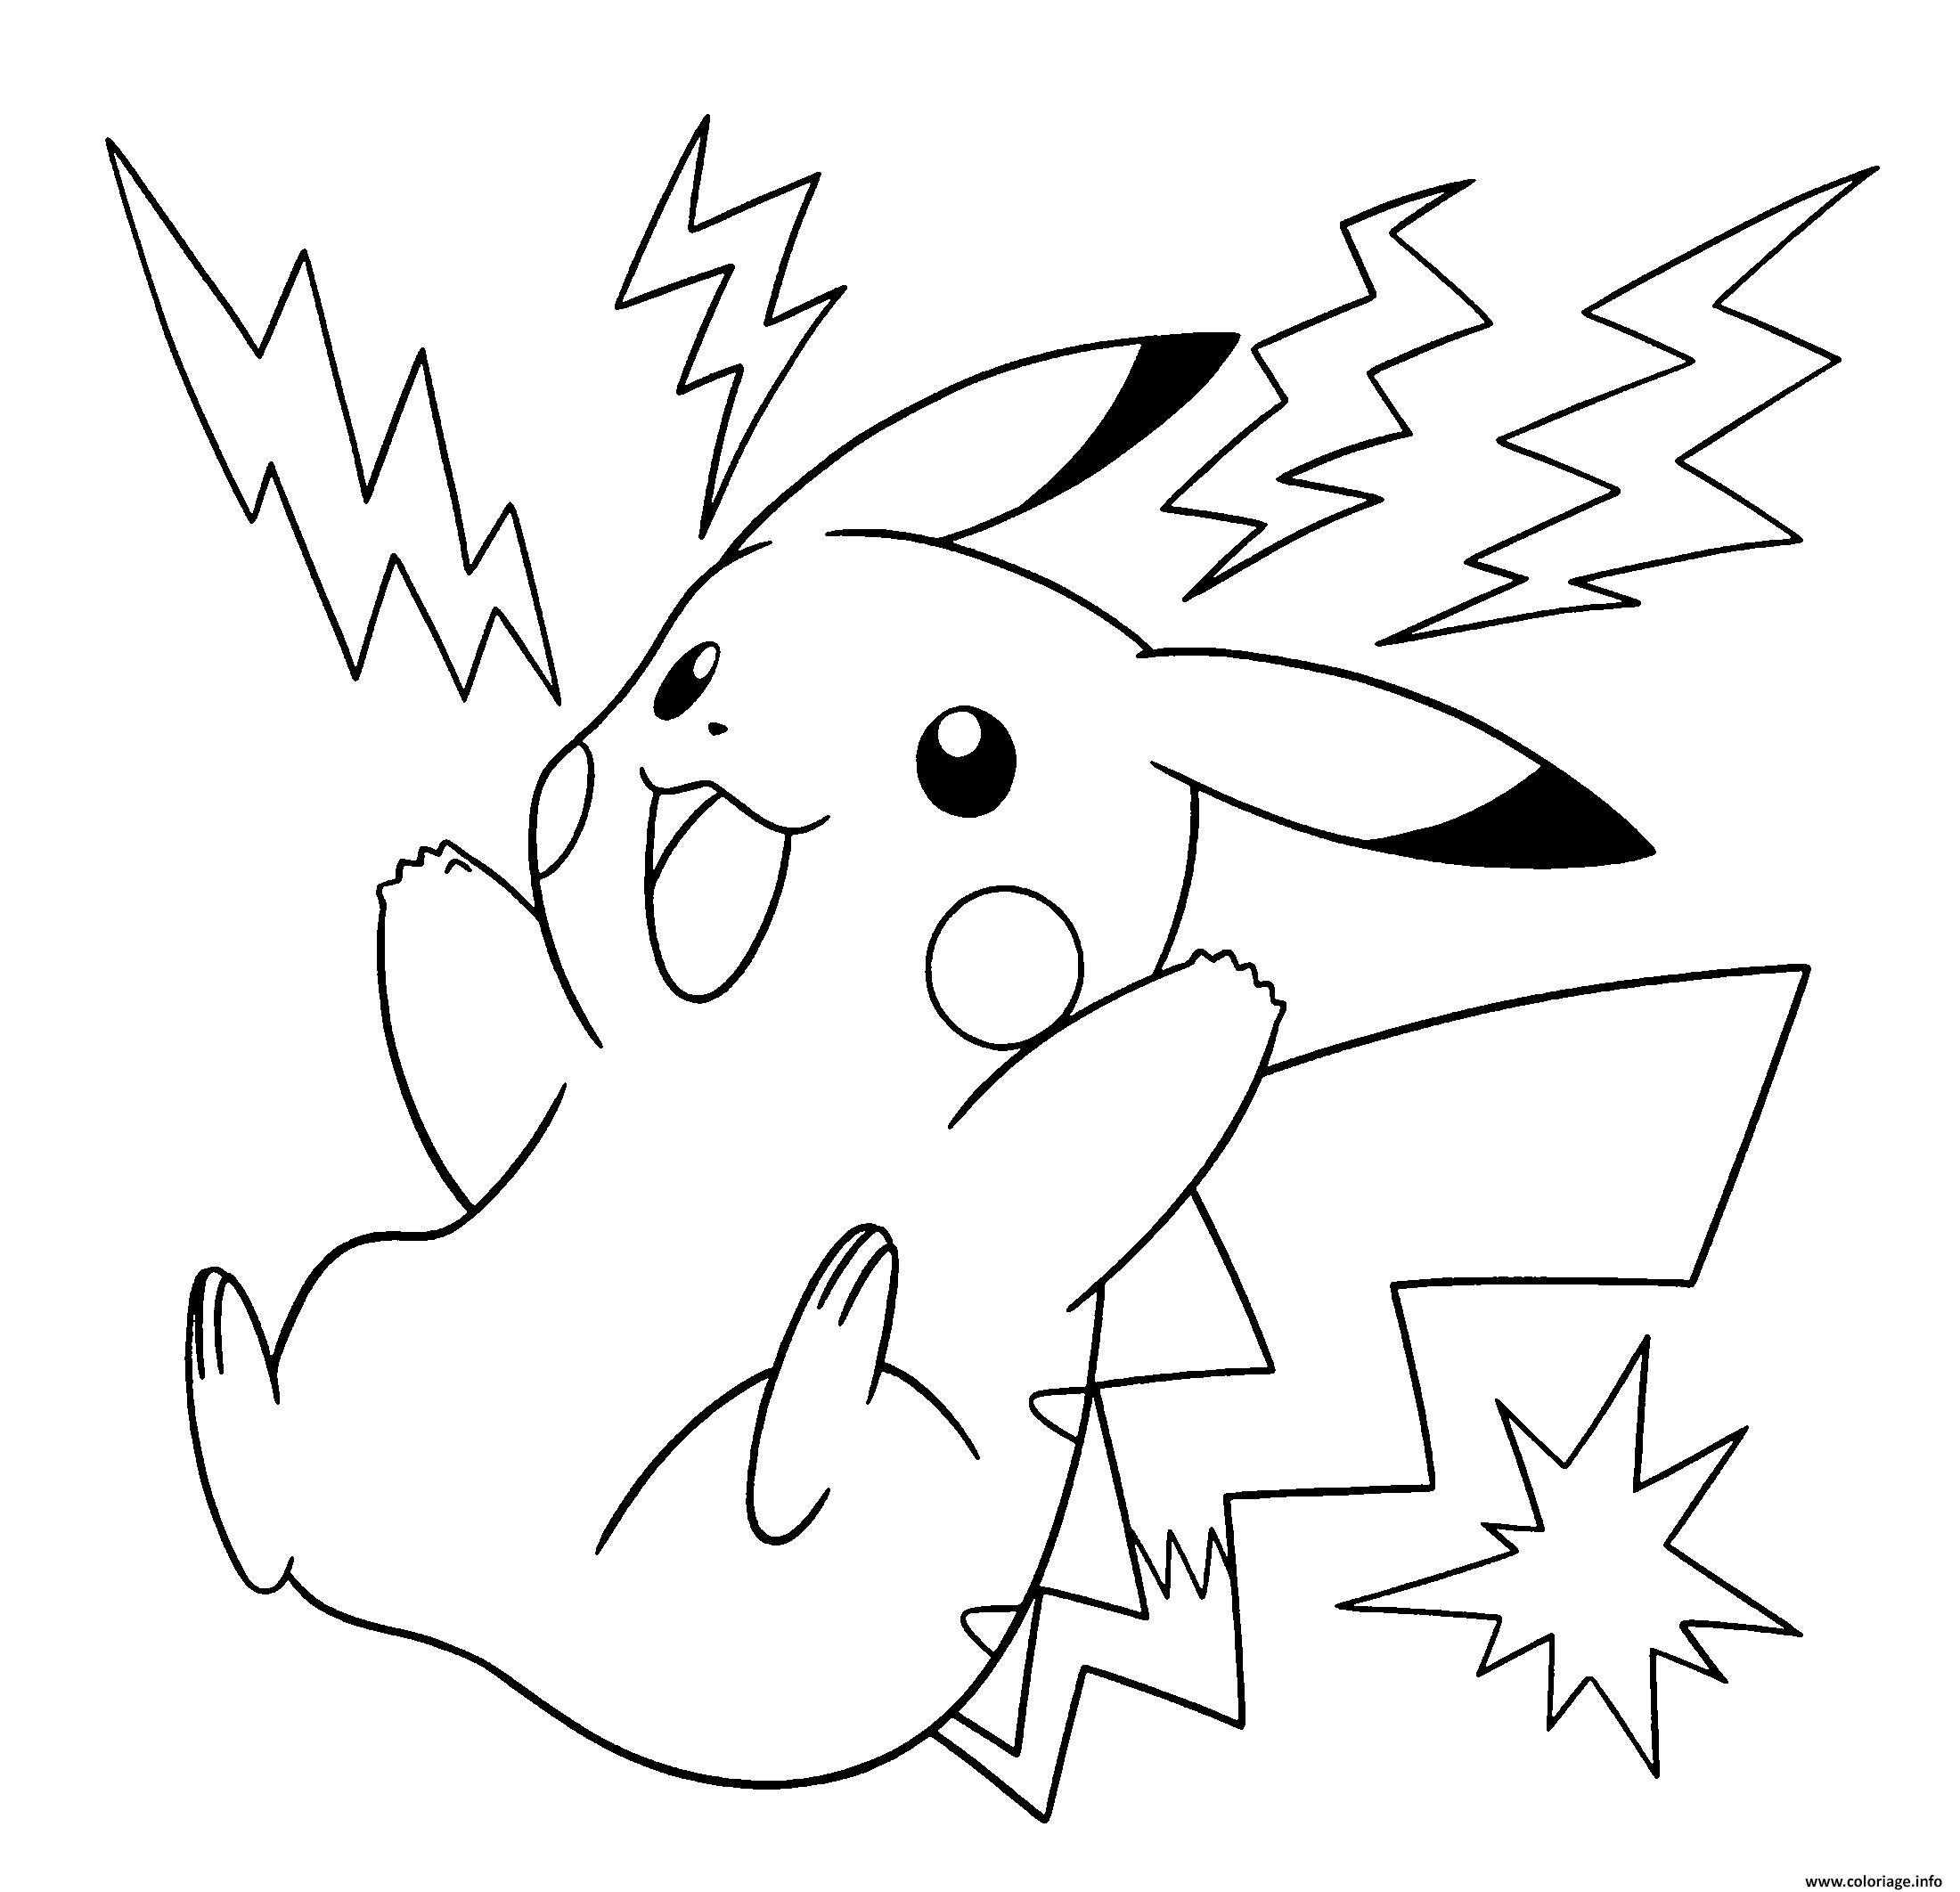 Coloriage A Imprimer Pikachu.Coloriage Pokemon Pikachu Electrique A Imprimer Coloriage